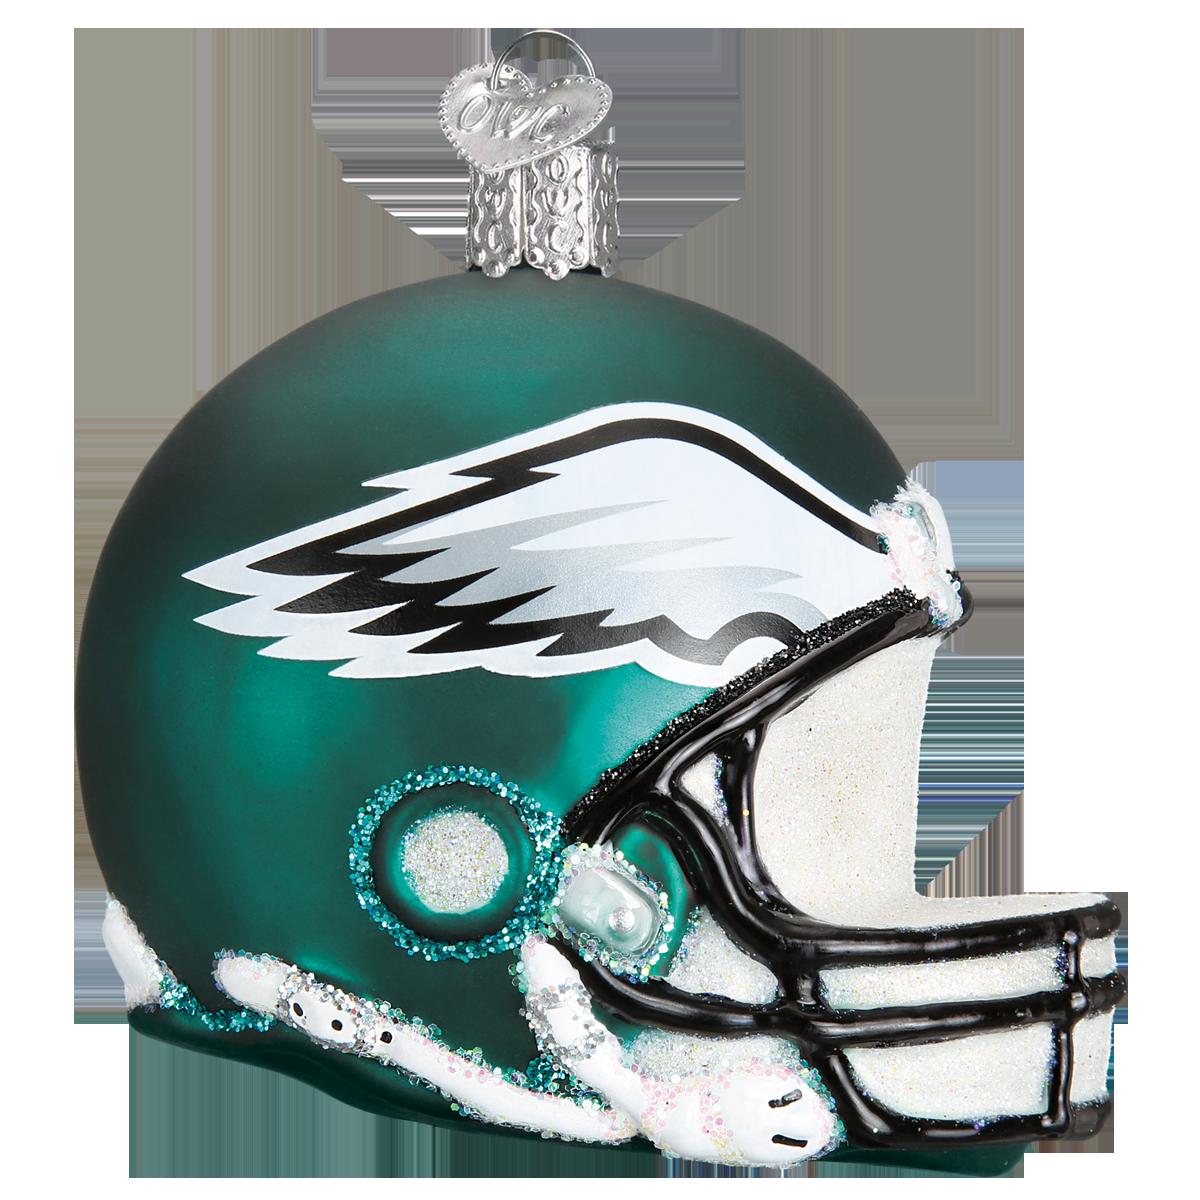 Eagles helmet png. Philadelphia football glass ornament